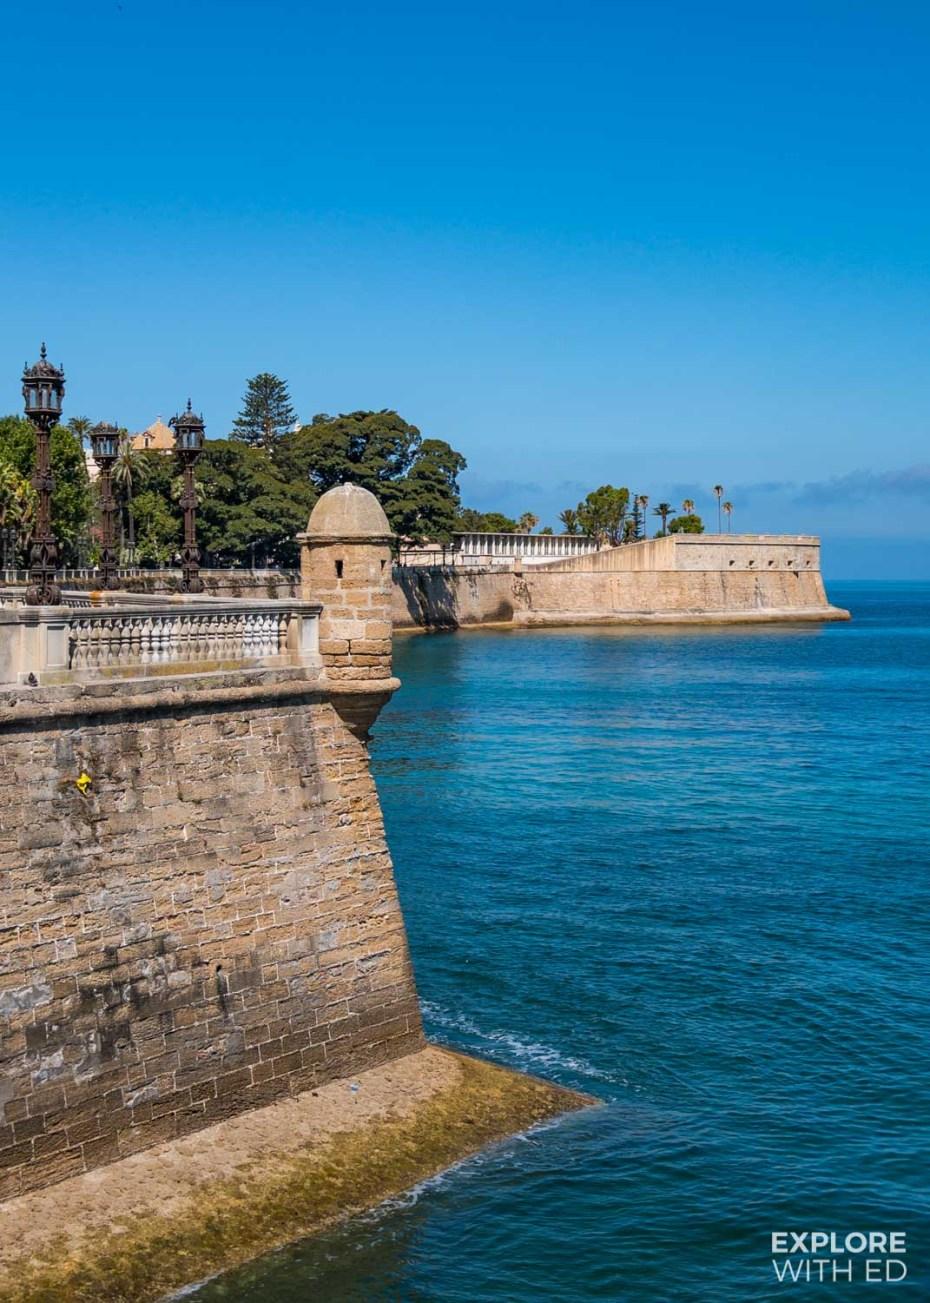 Walking tour of Cadiz along the sea